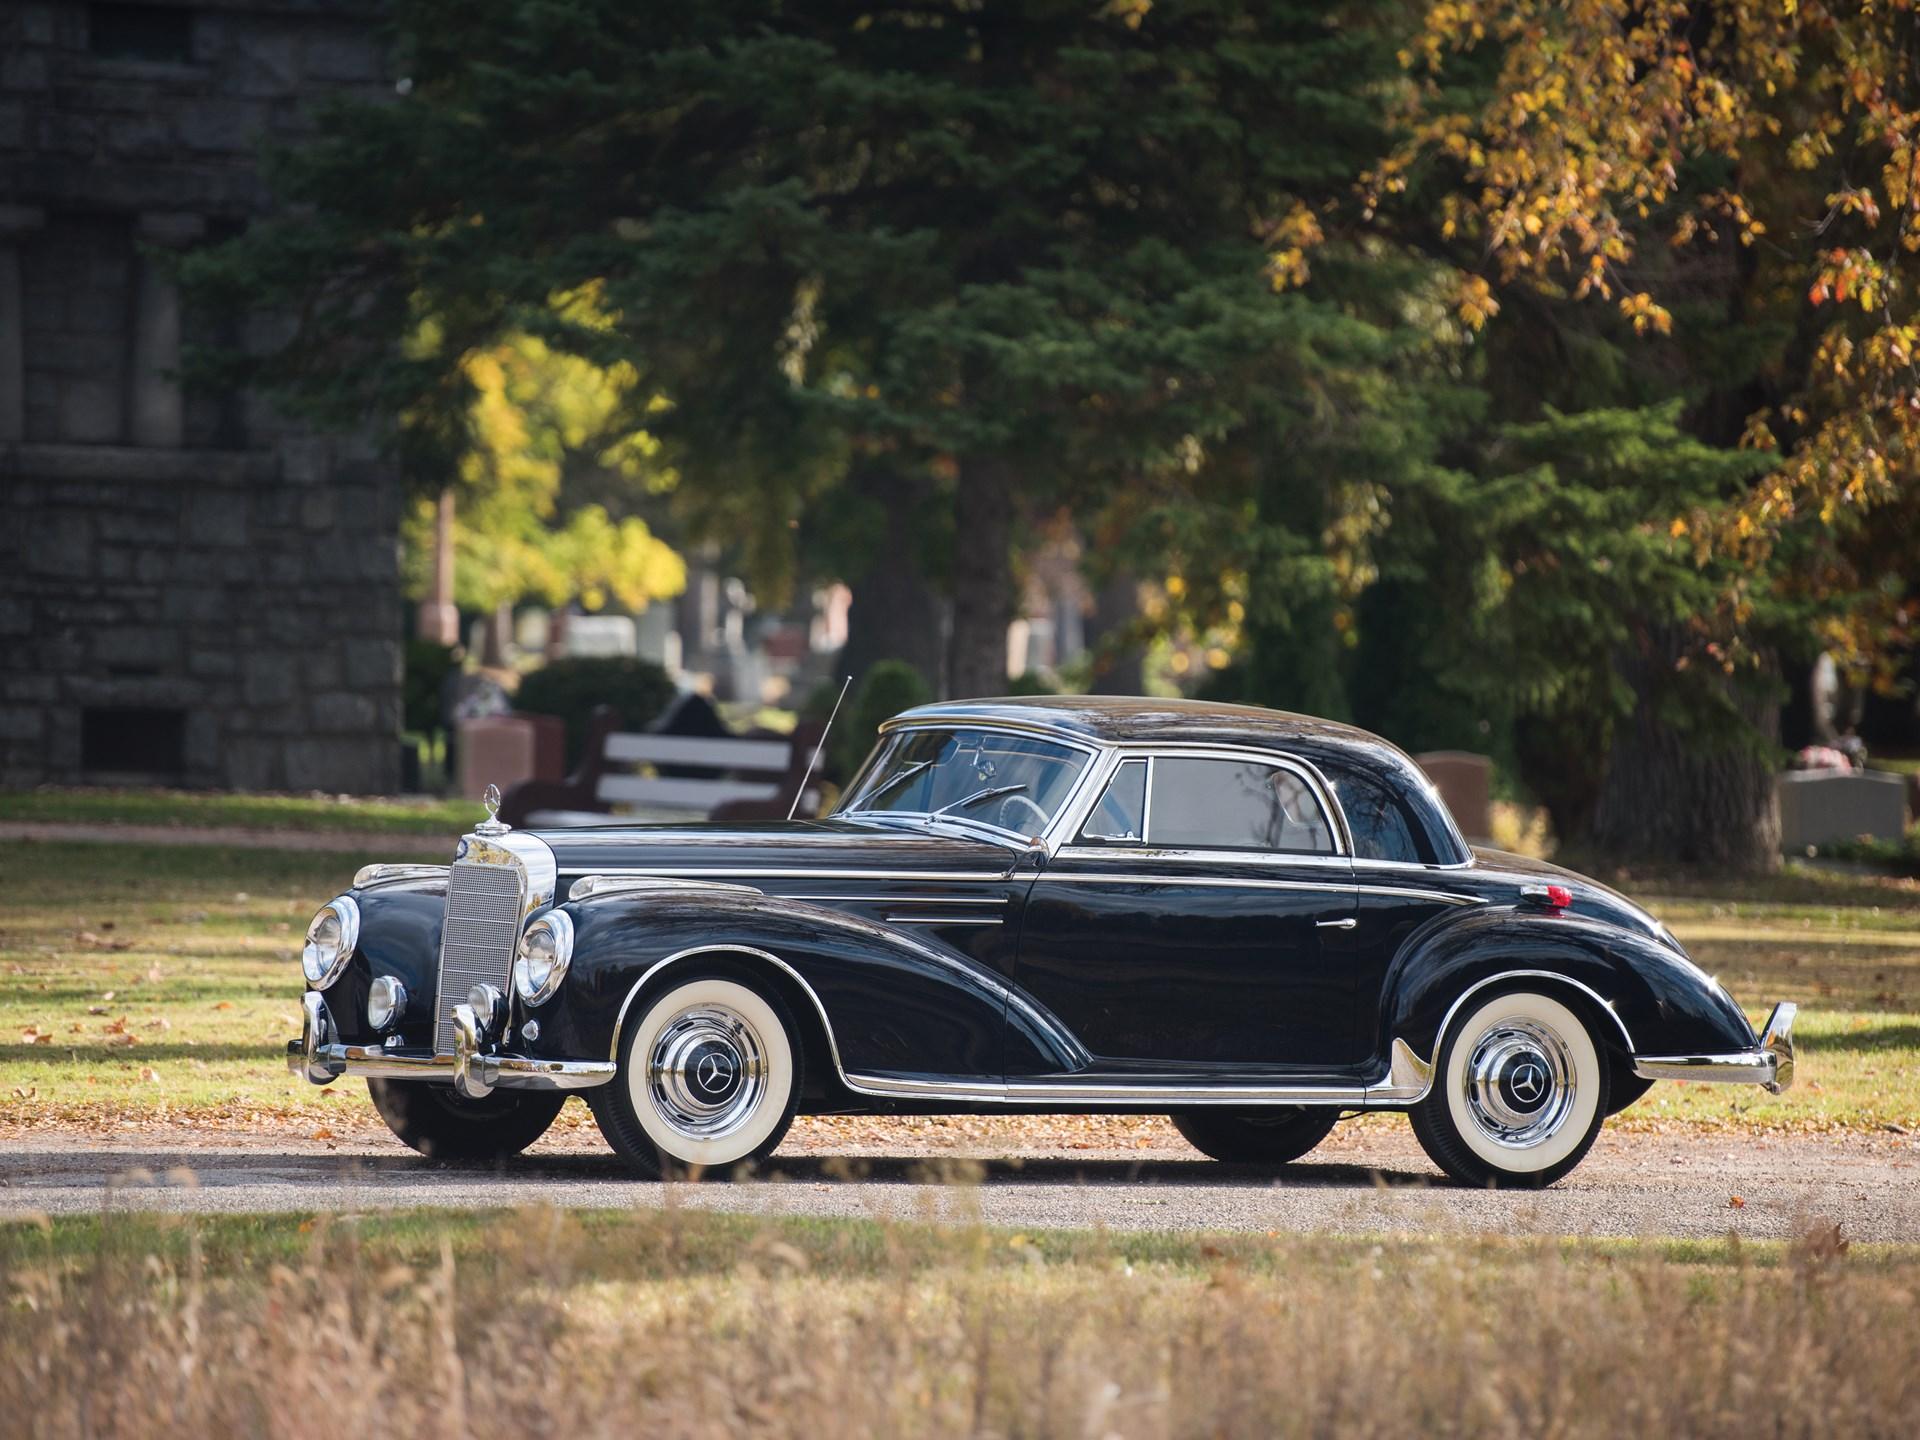 RM Sotheby's - 1955 Mercedes-Benz 300 Sc Coupe | New York ...